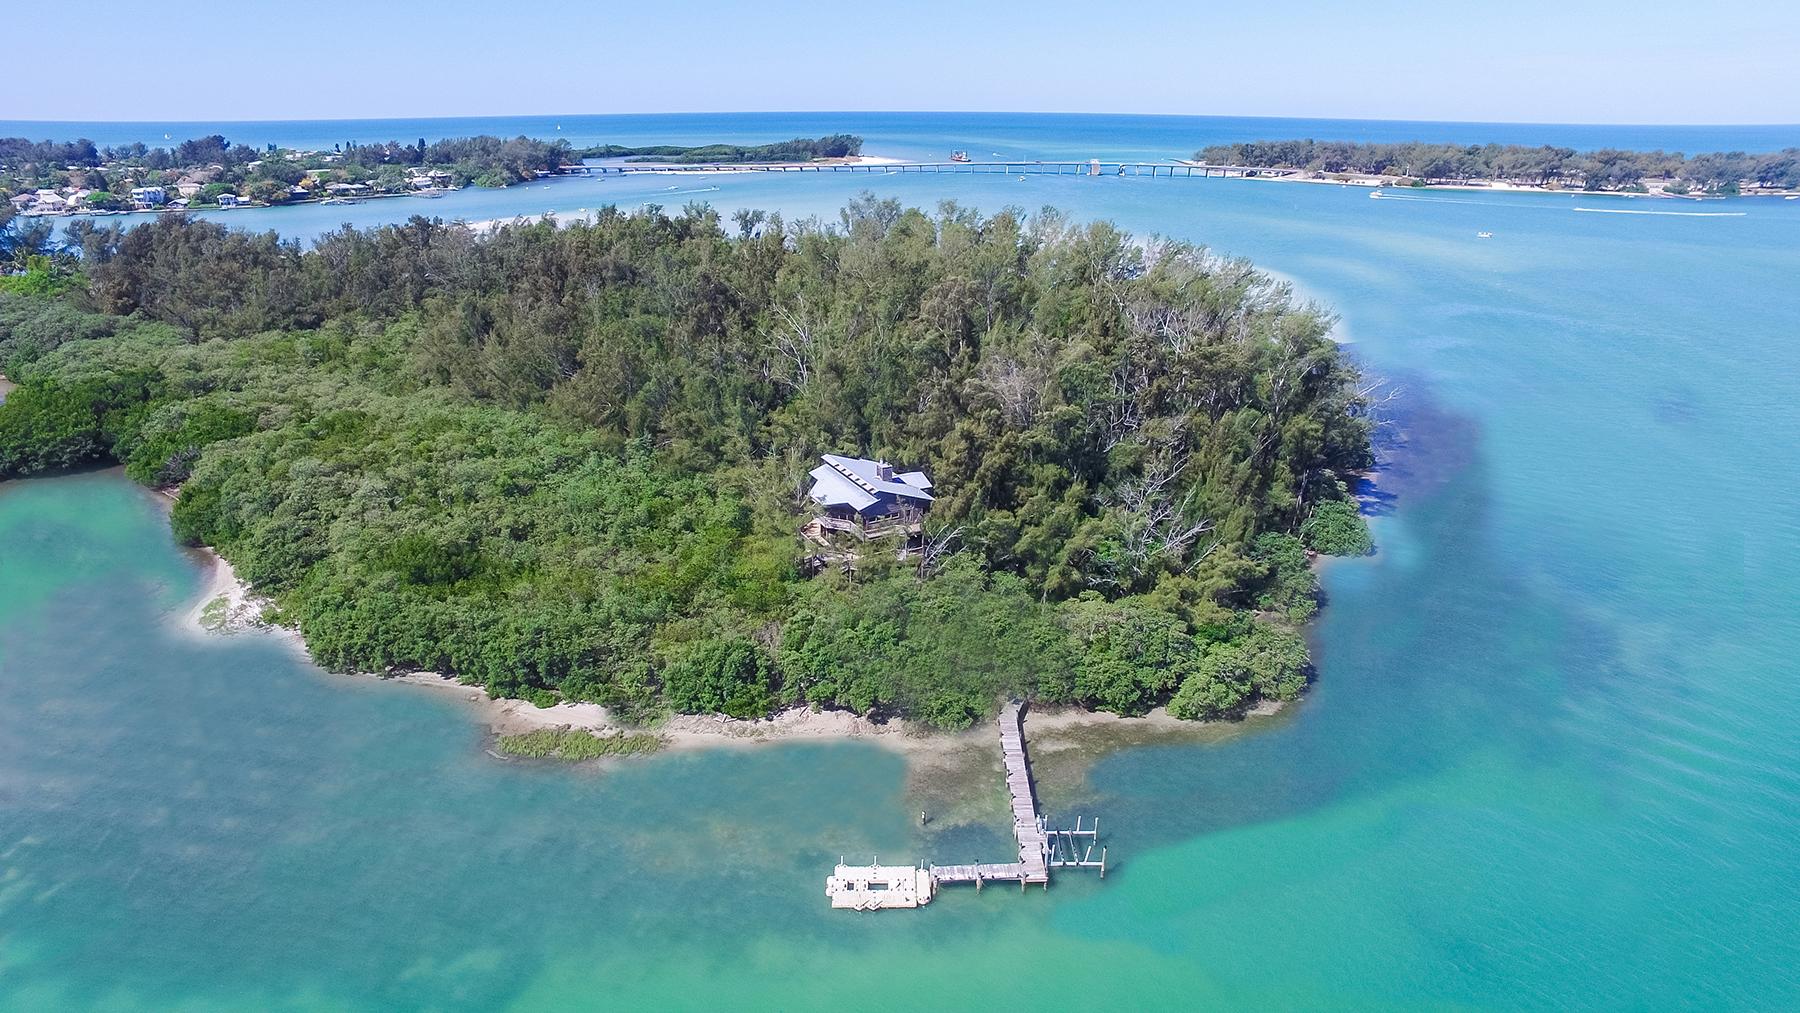 Moradia para Venda às JEWFISH KEY 7140 La Lenaire Dr Longboat Key, Florida, 34228 Estados Unidos